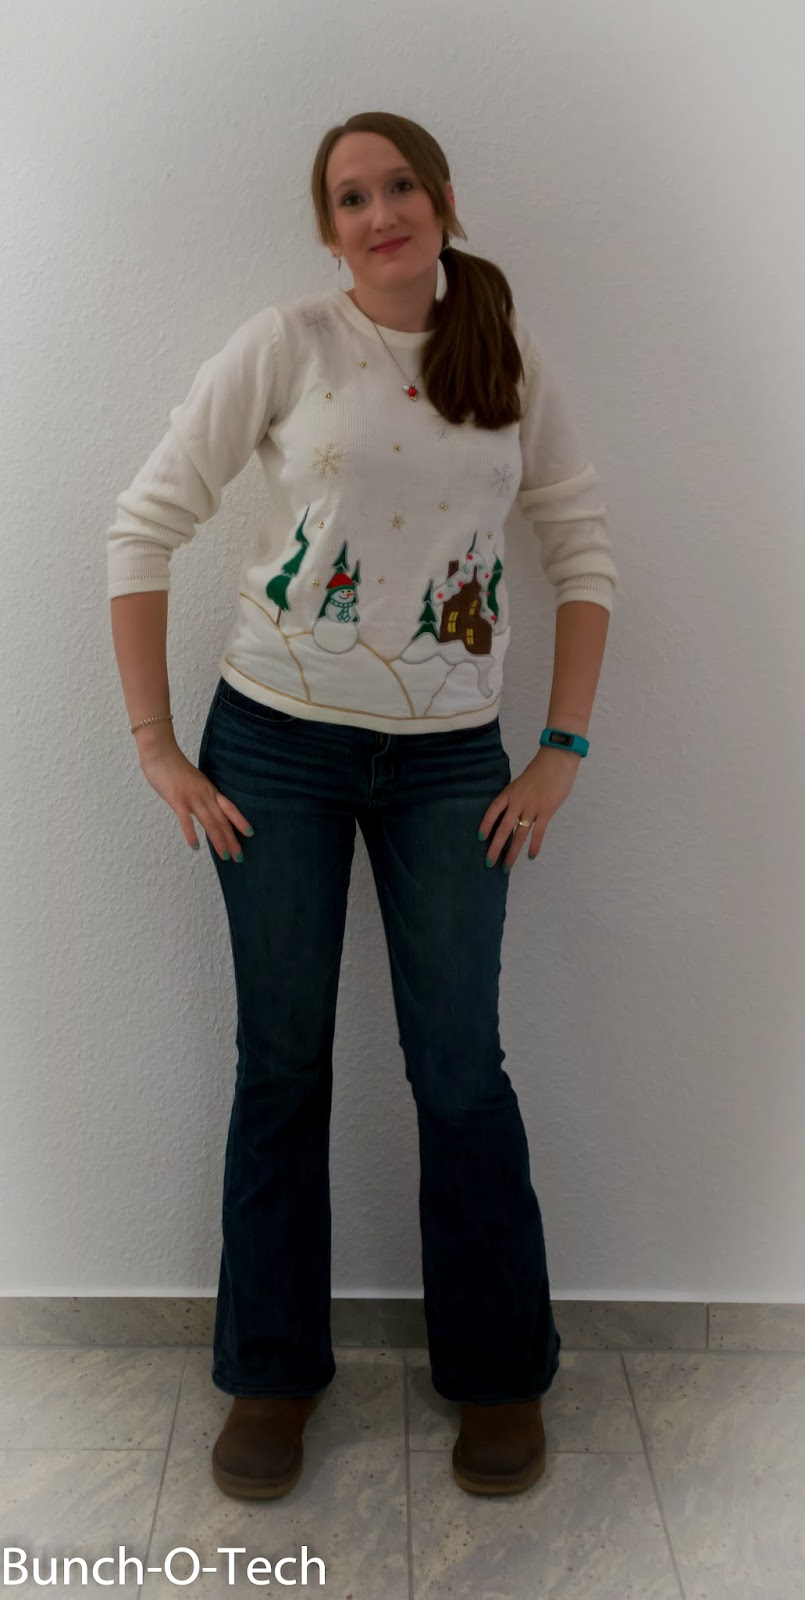 Amy-3-December%2B17%2C%2B2014.jpg